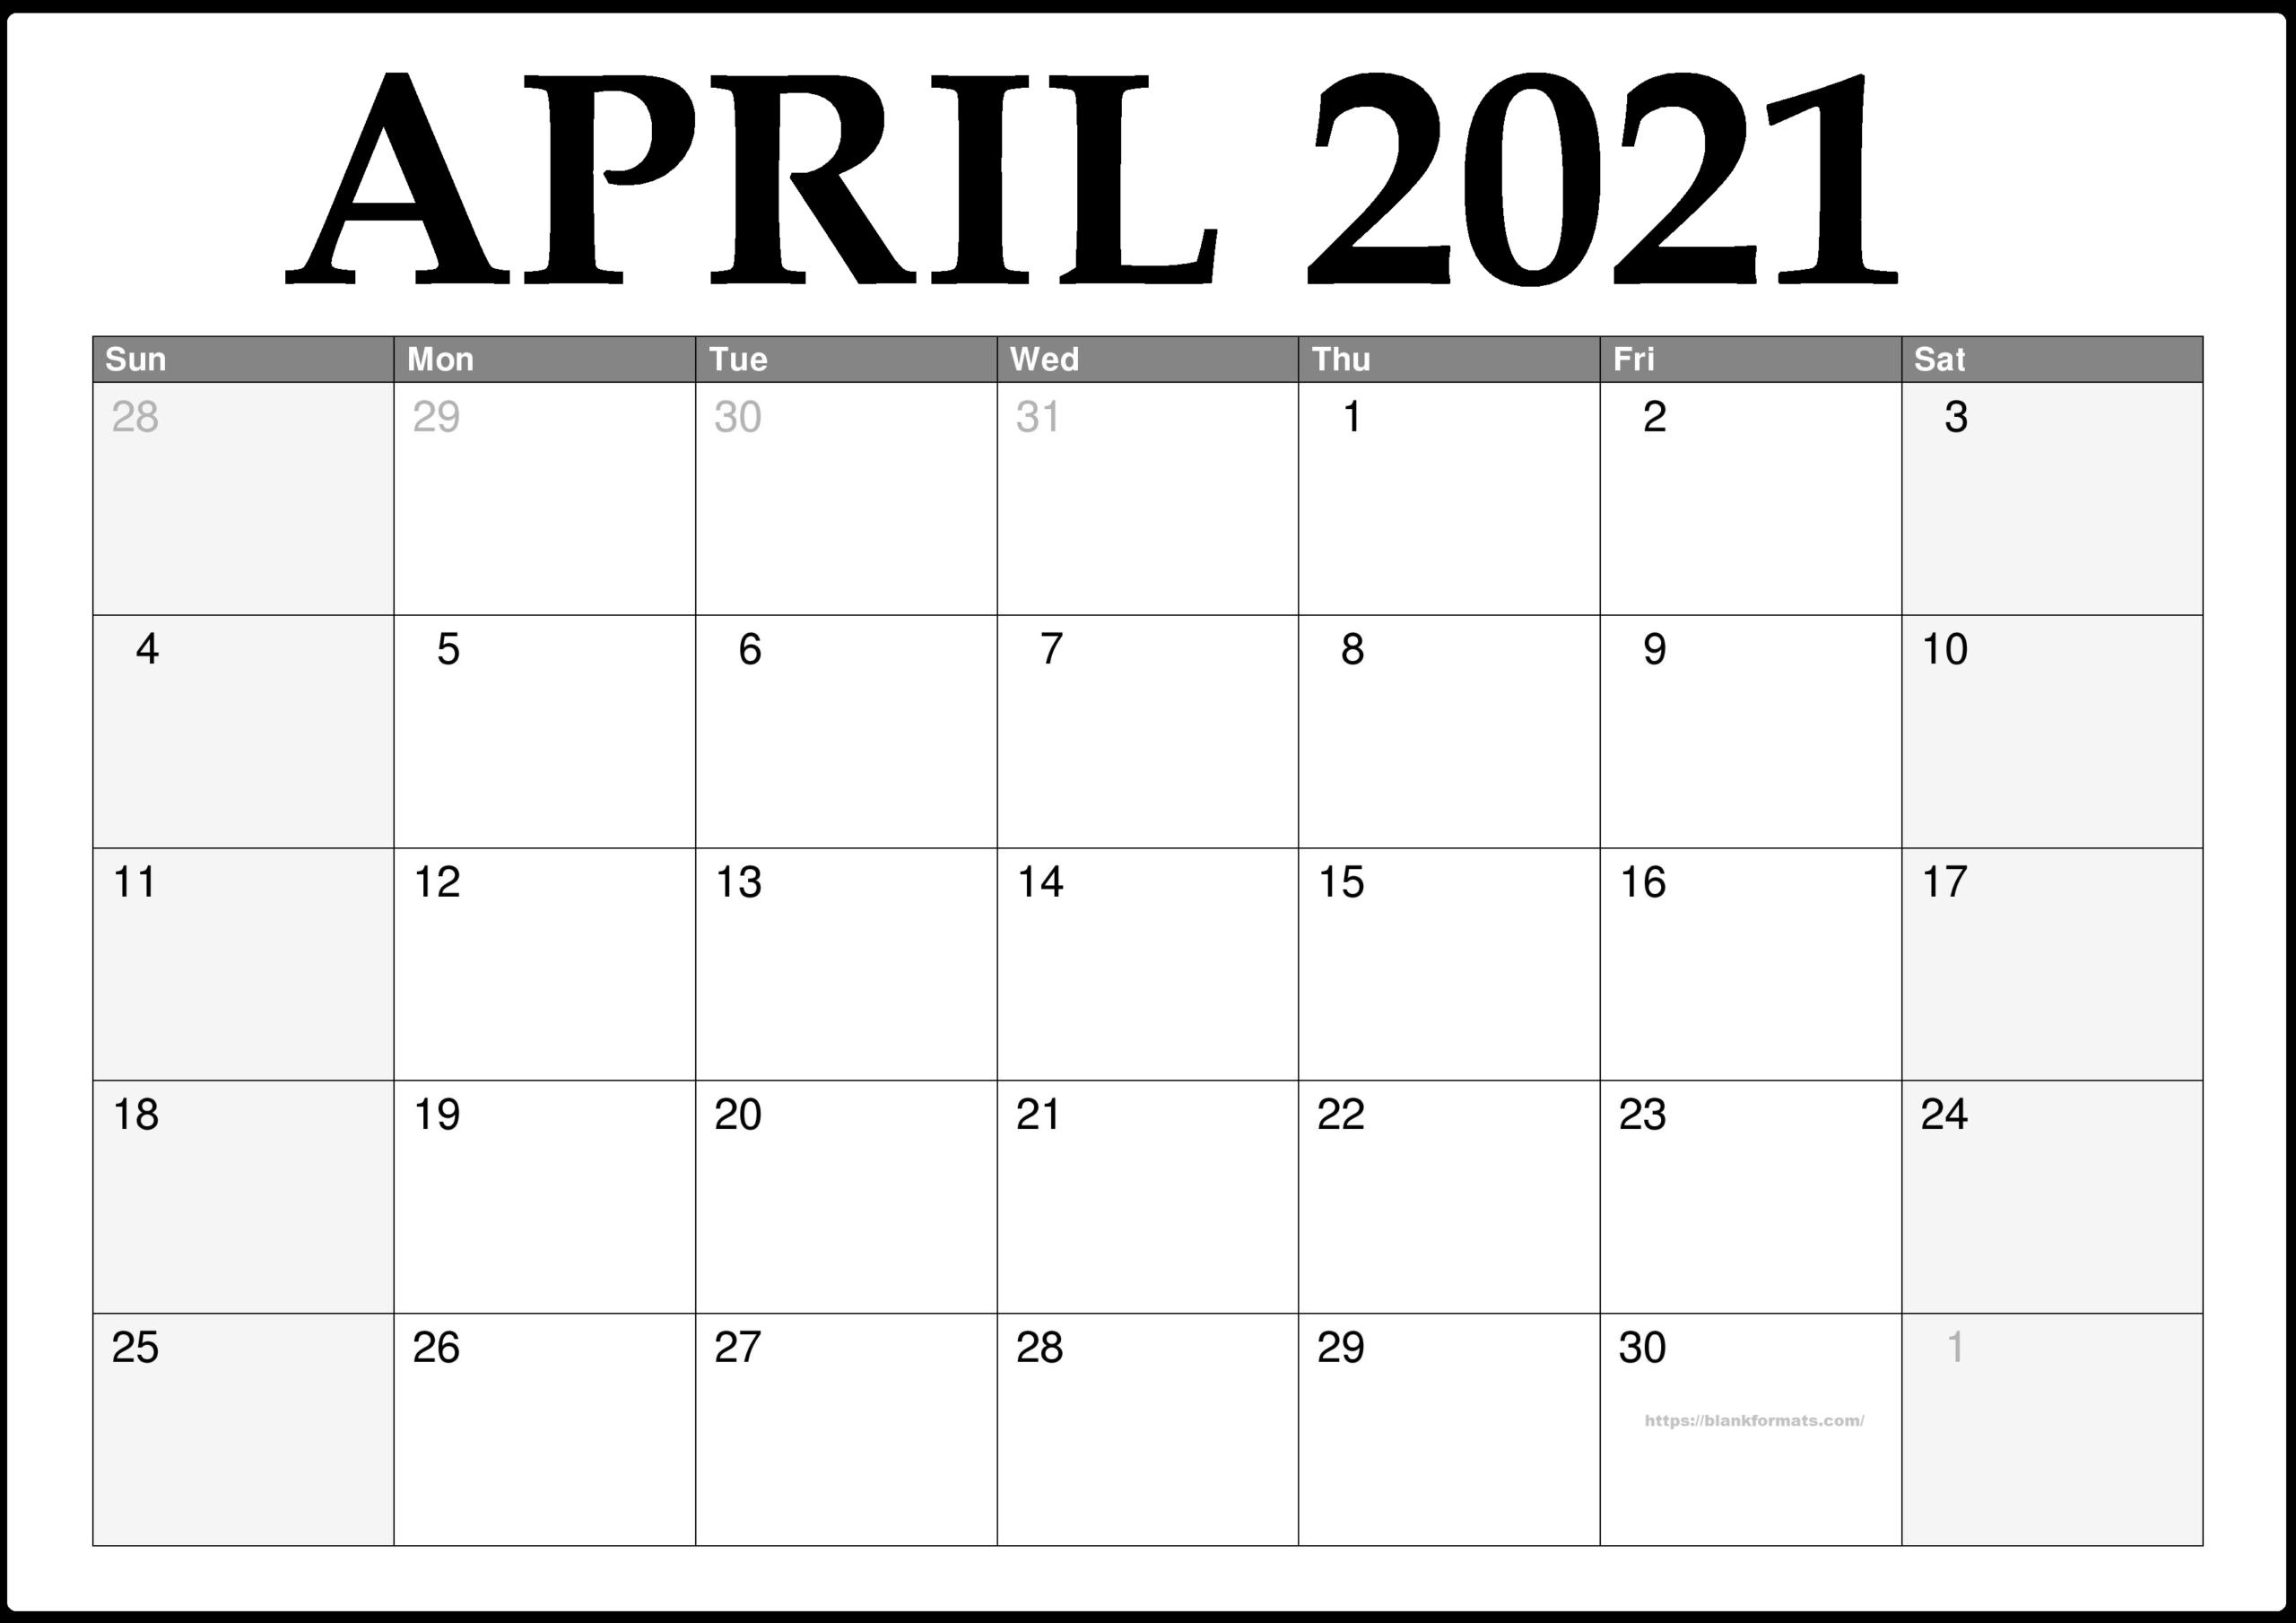 April 2021 Calendar Pdf Word Excel Documents Sheet